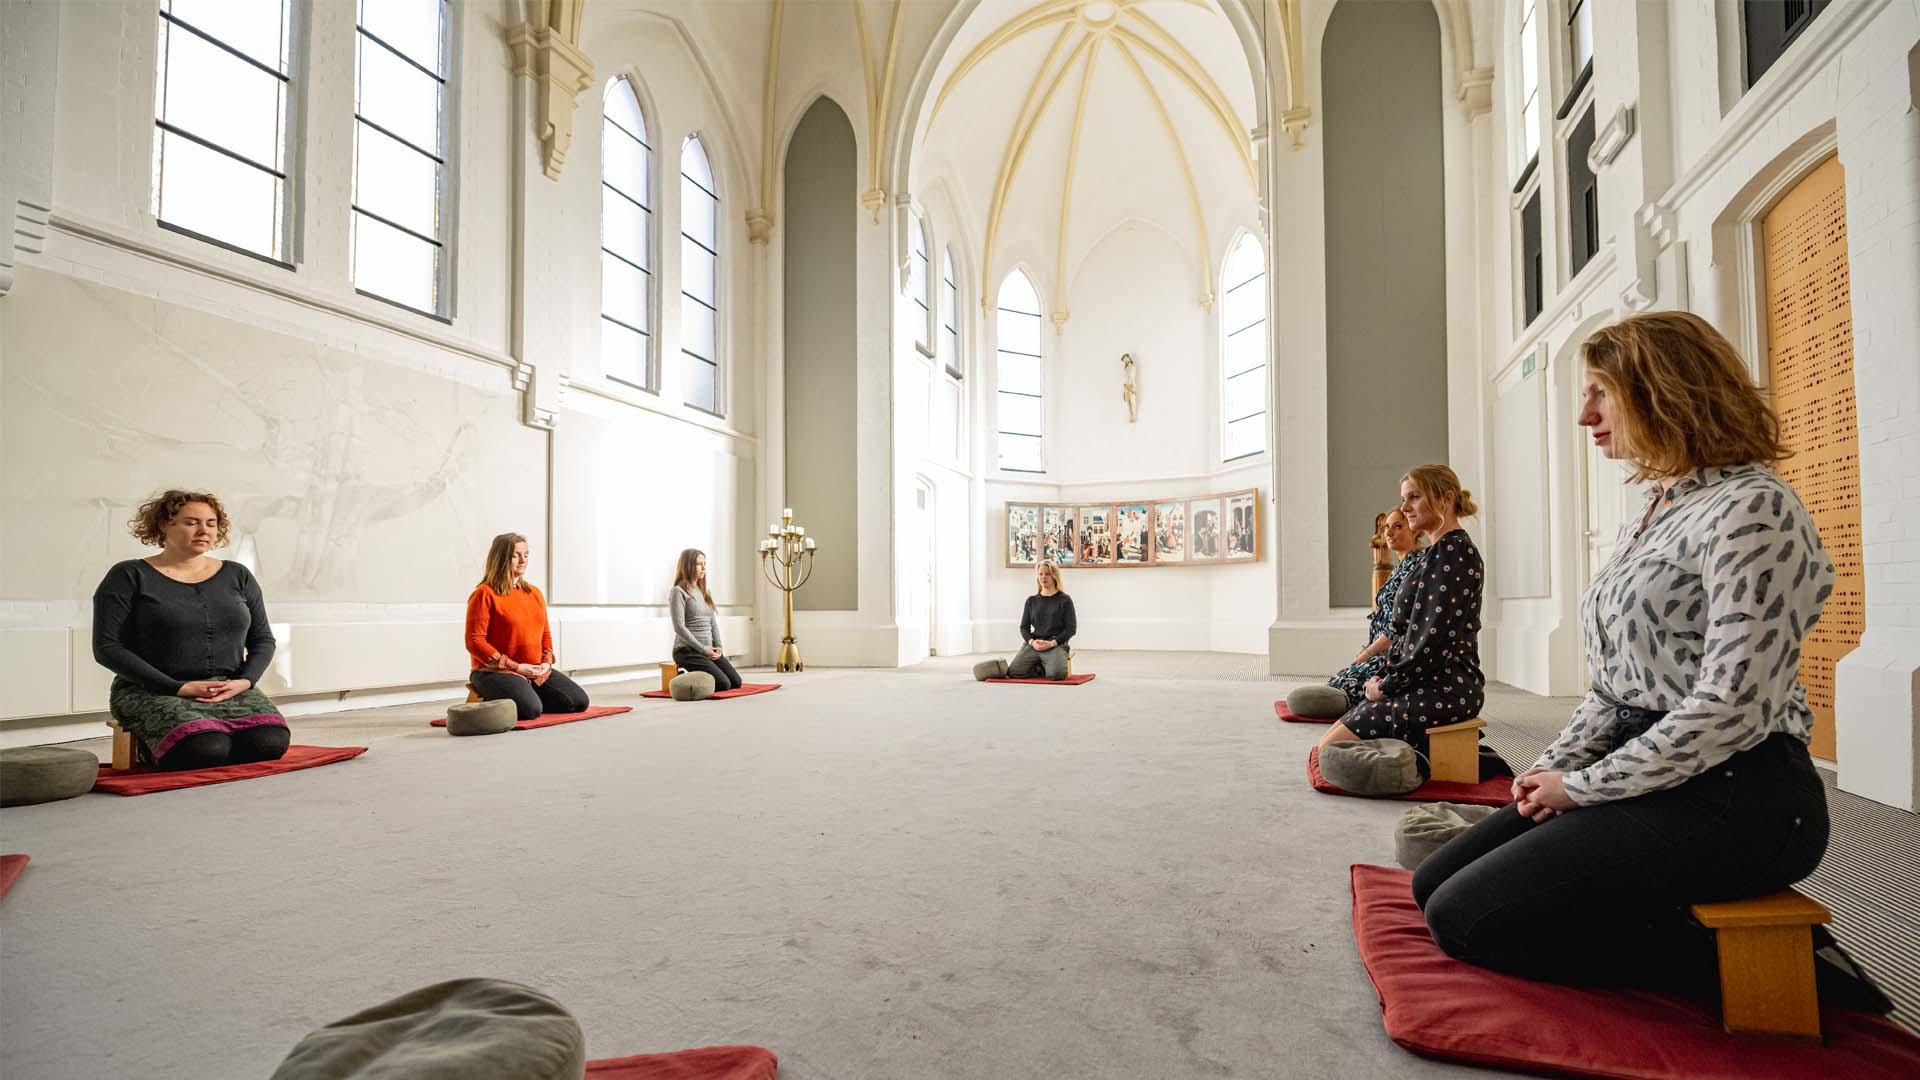 Kloosterhotel ZIN Kapel meditatie stilte stil mediteren